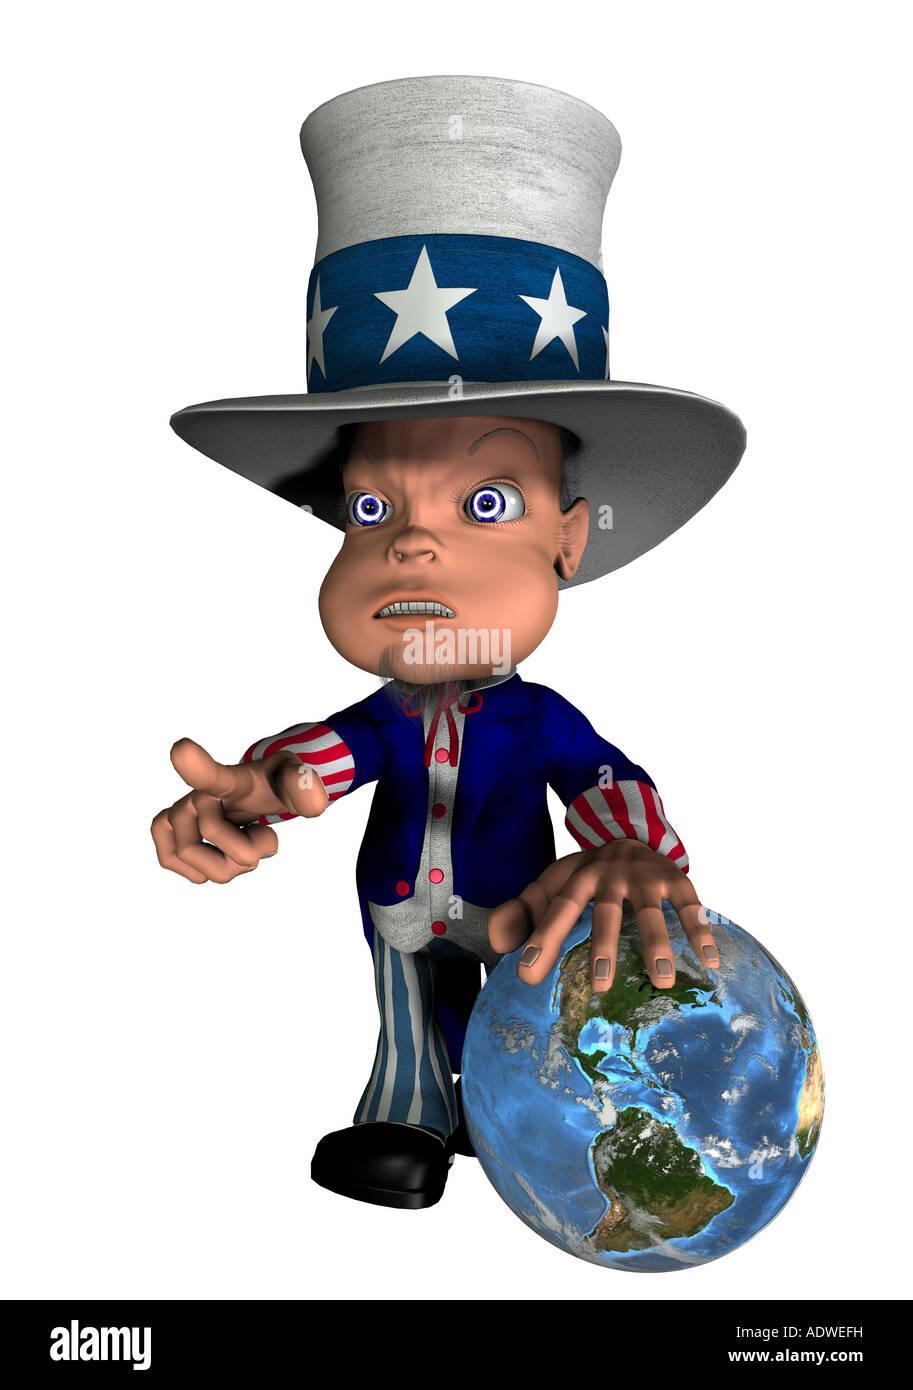 Uncle Sam Cartoon Stock Photos & Uncle Sam Cartoon Stock ...